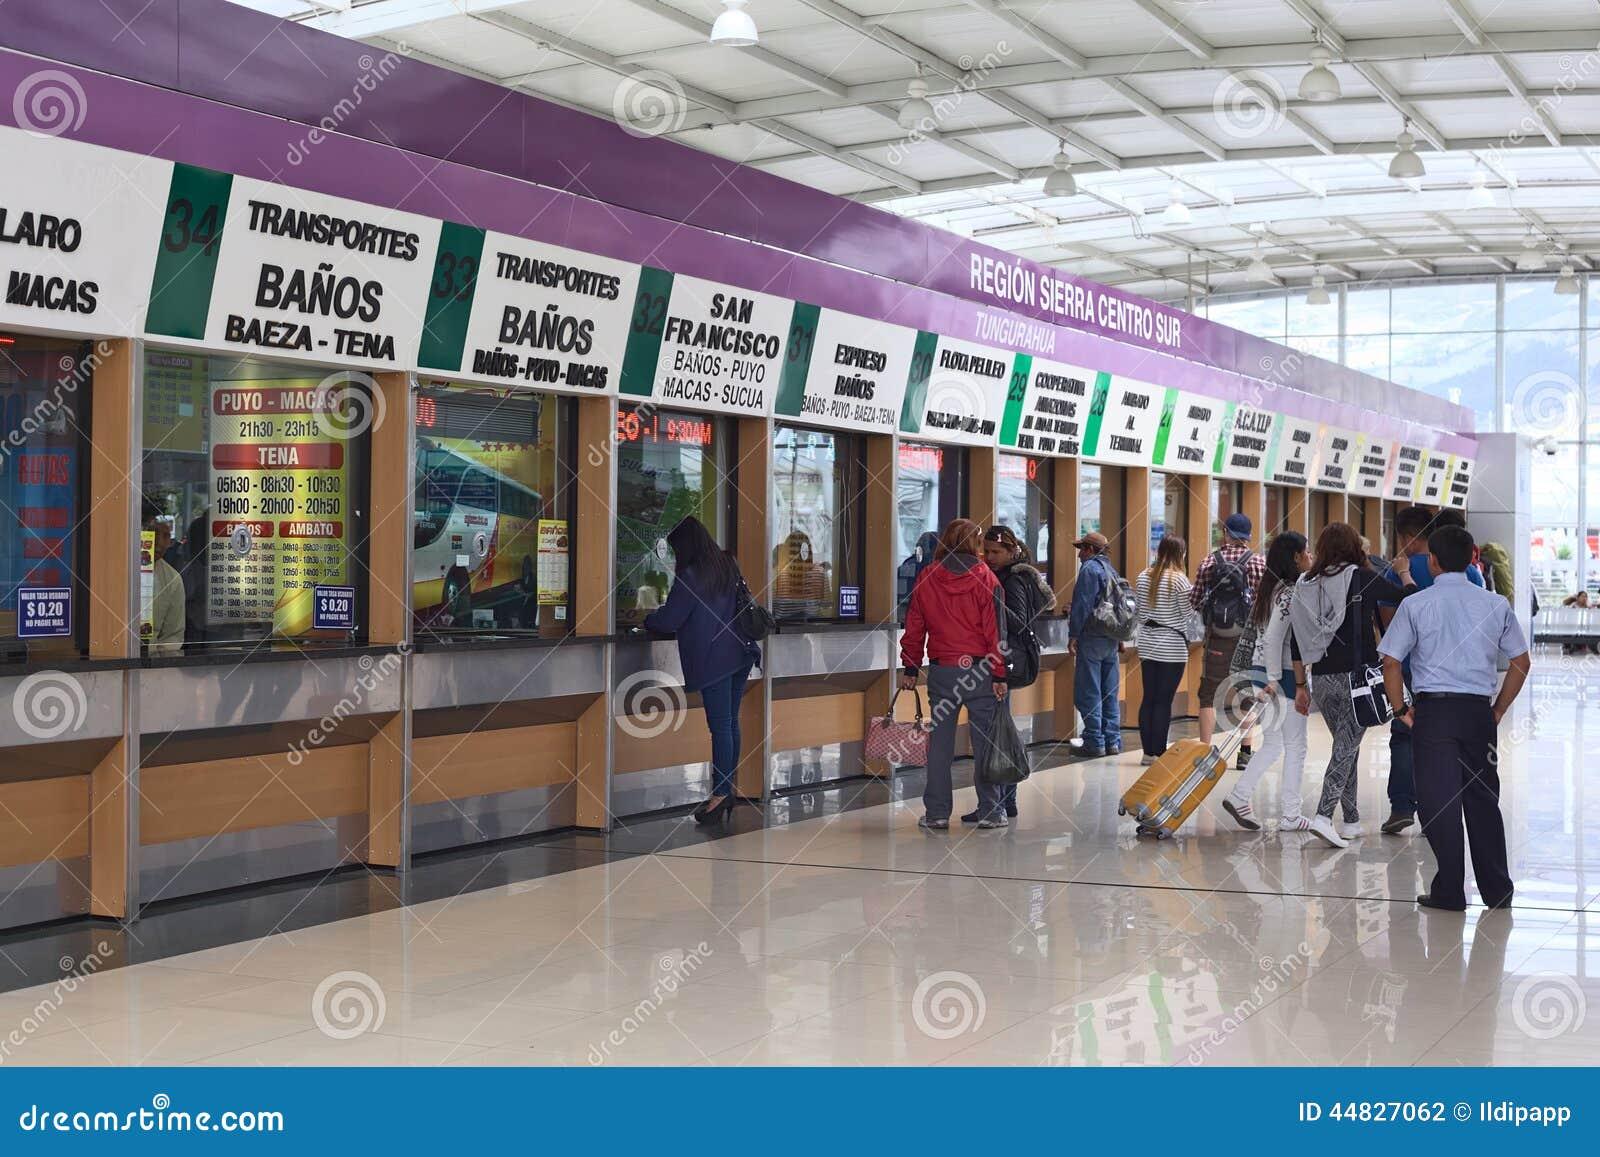 Ticket offices in quitumbe bus terminal in quito ecuador for Office design quito